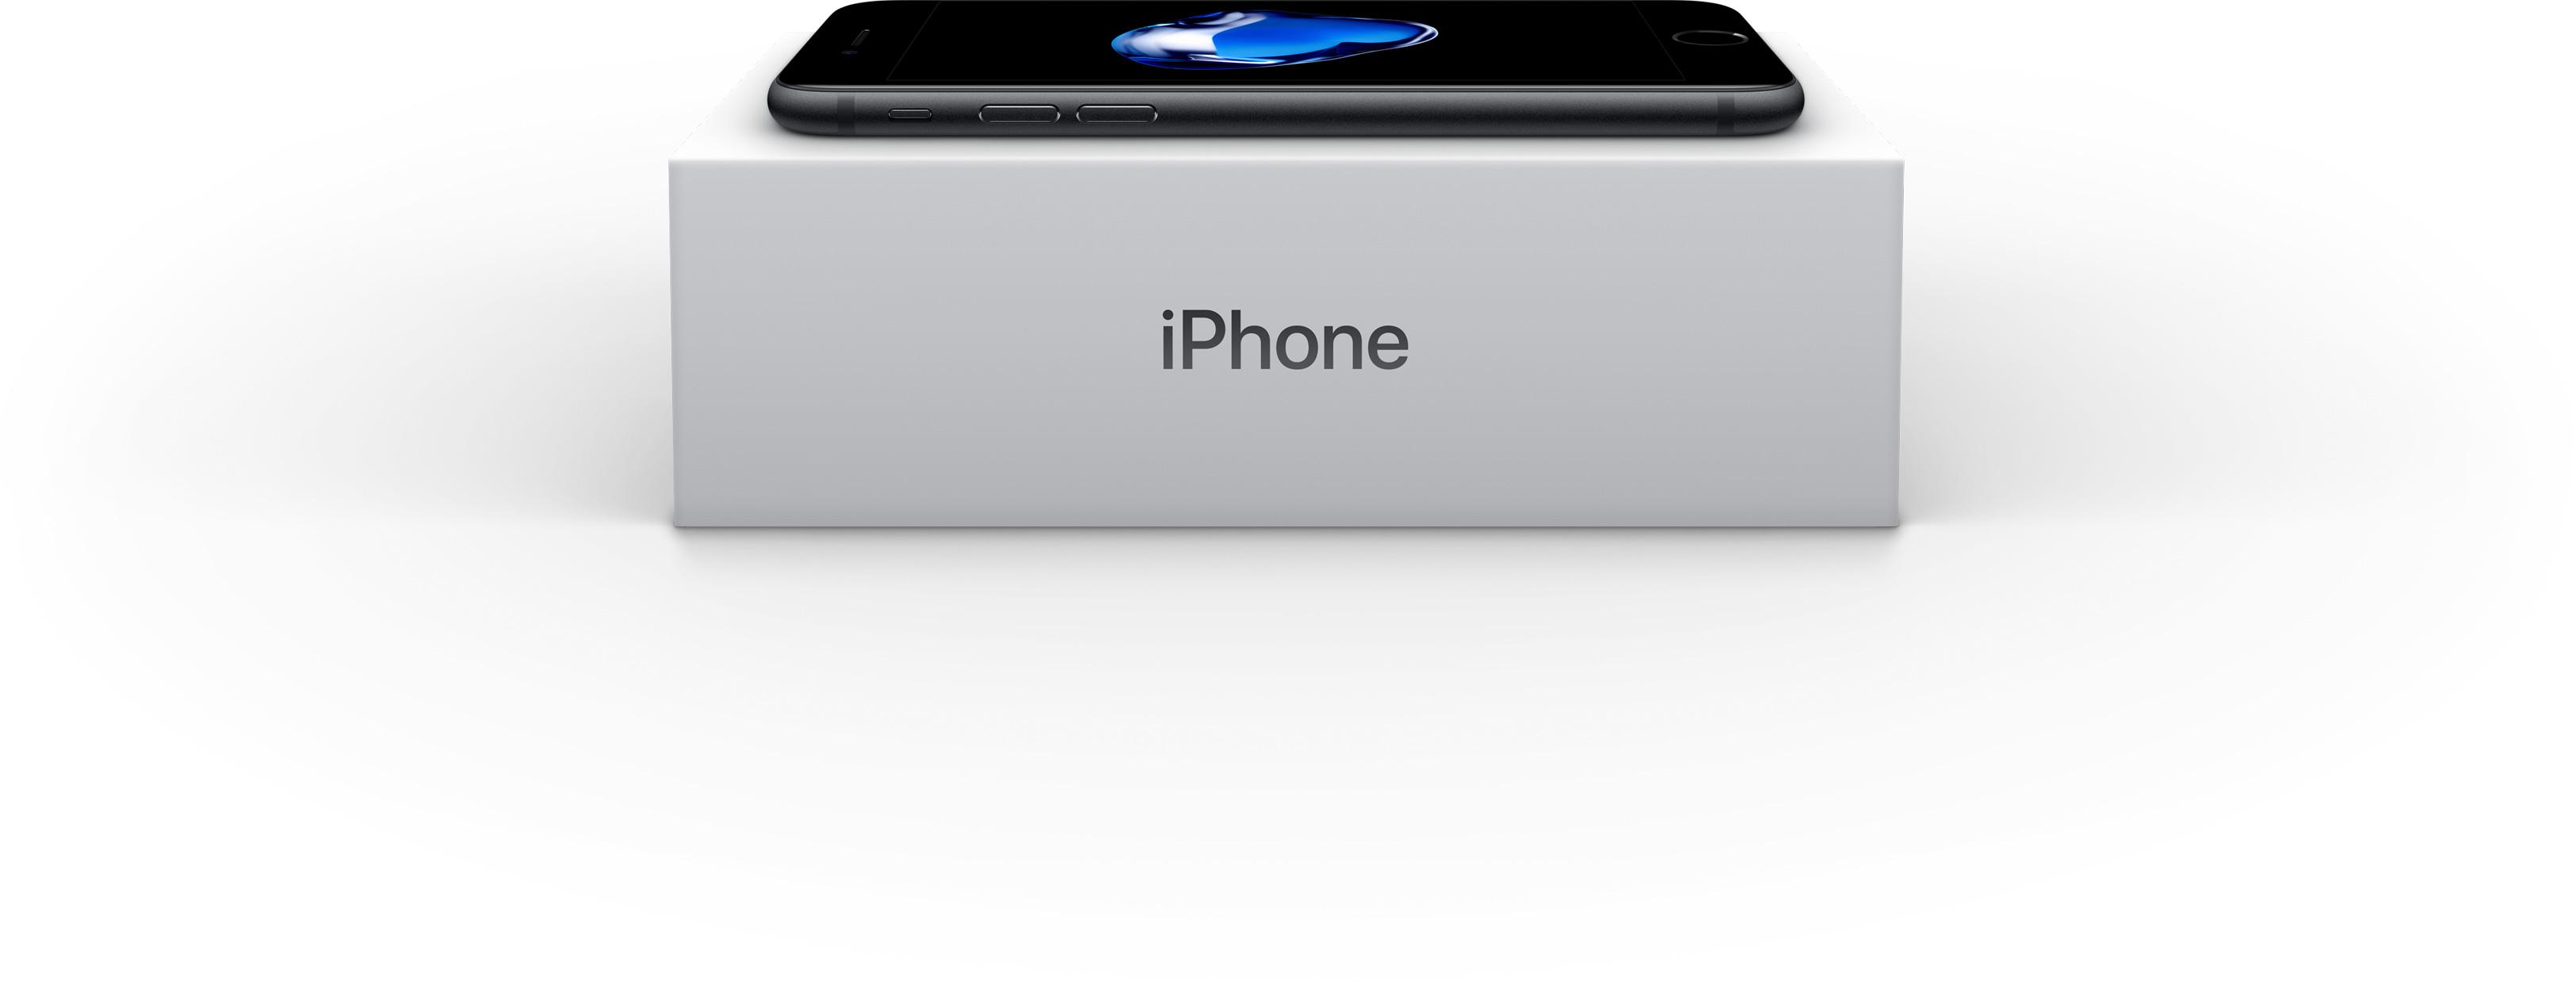 Apple iPhone 7 коробка